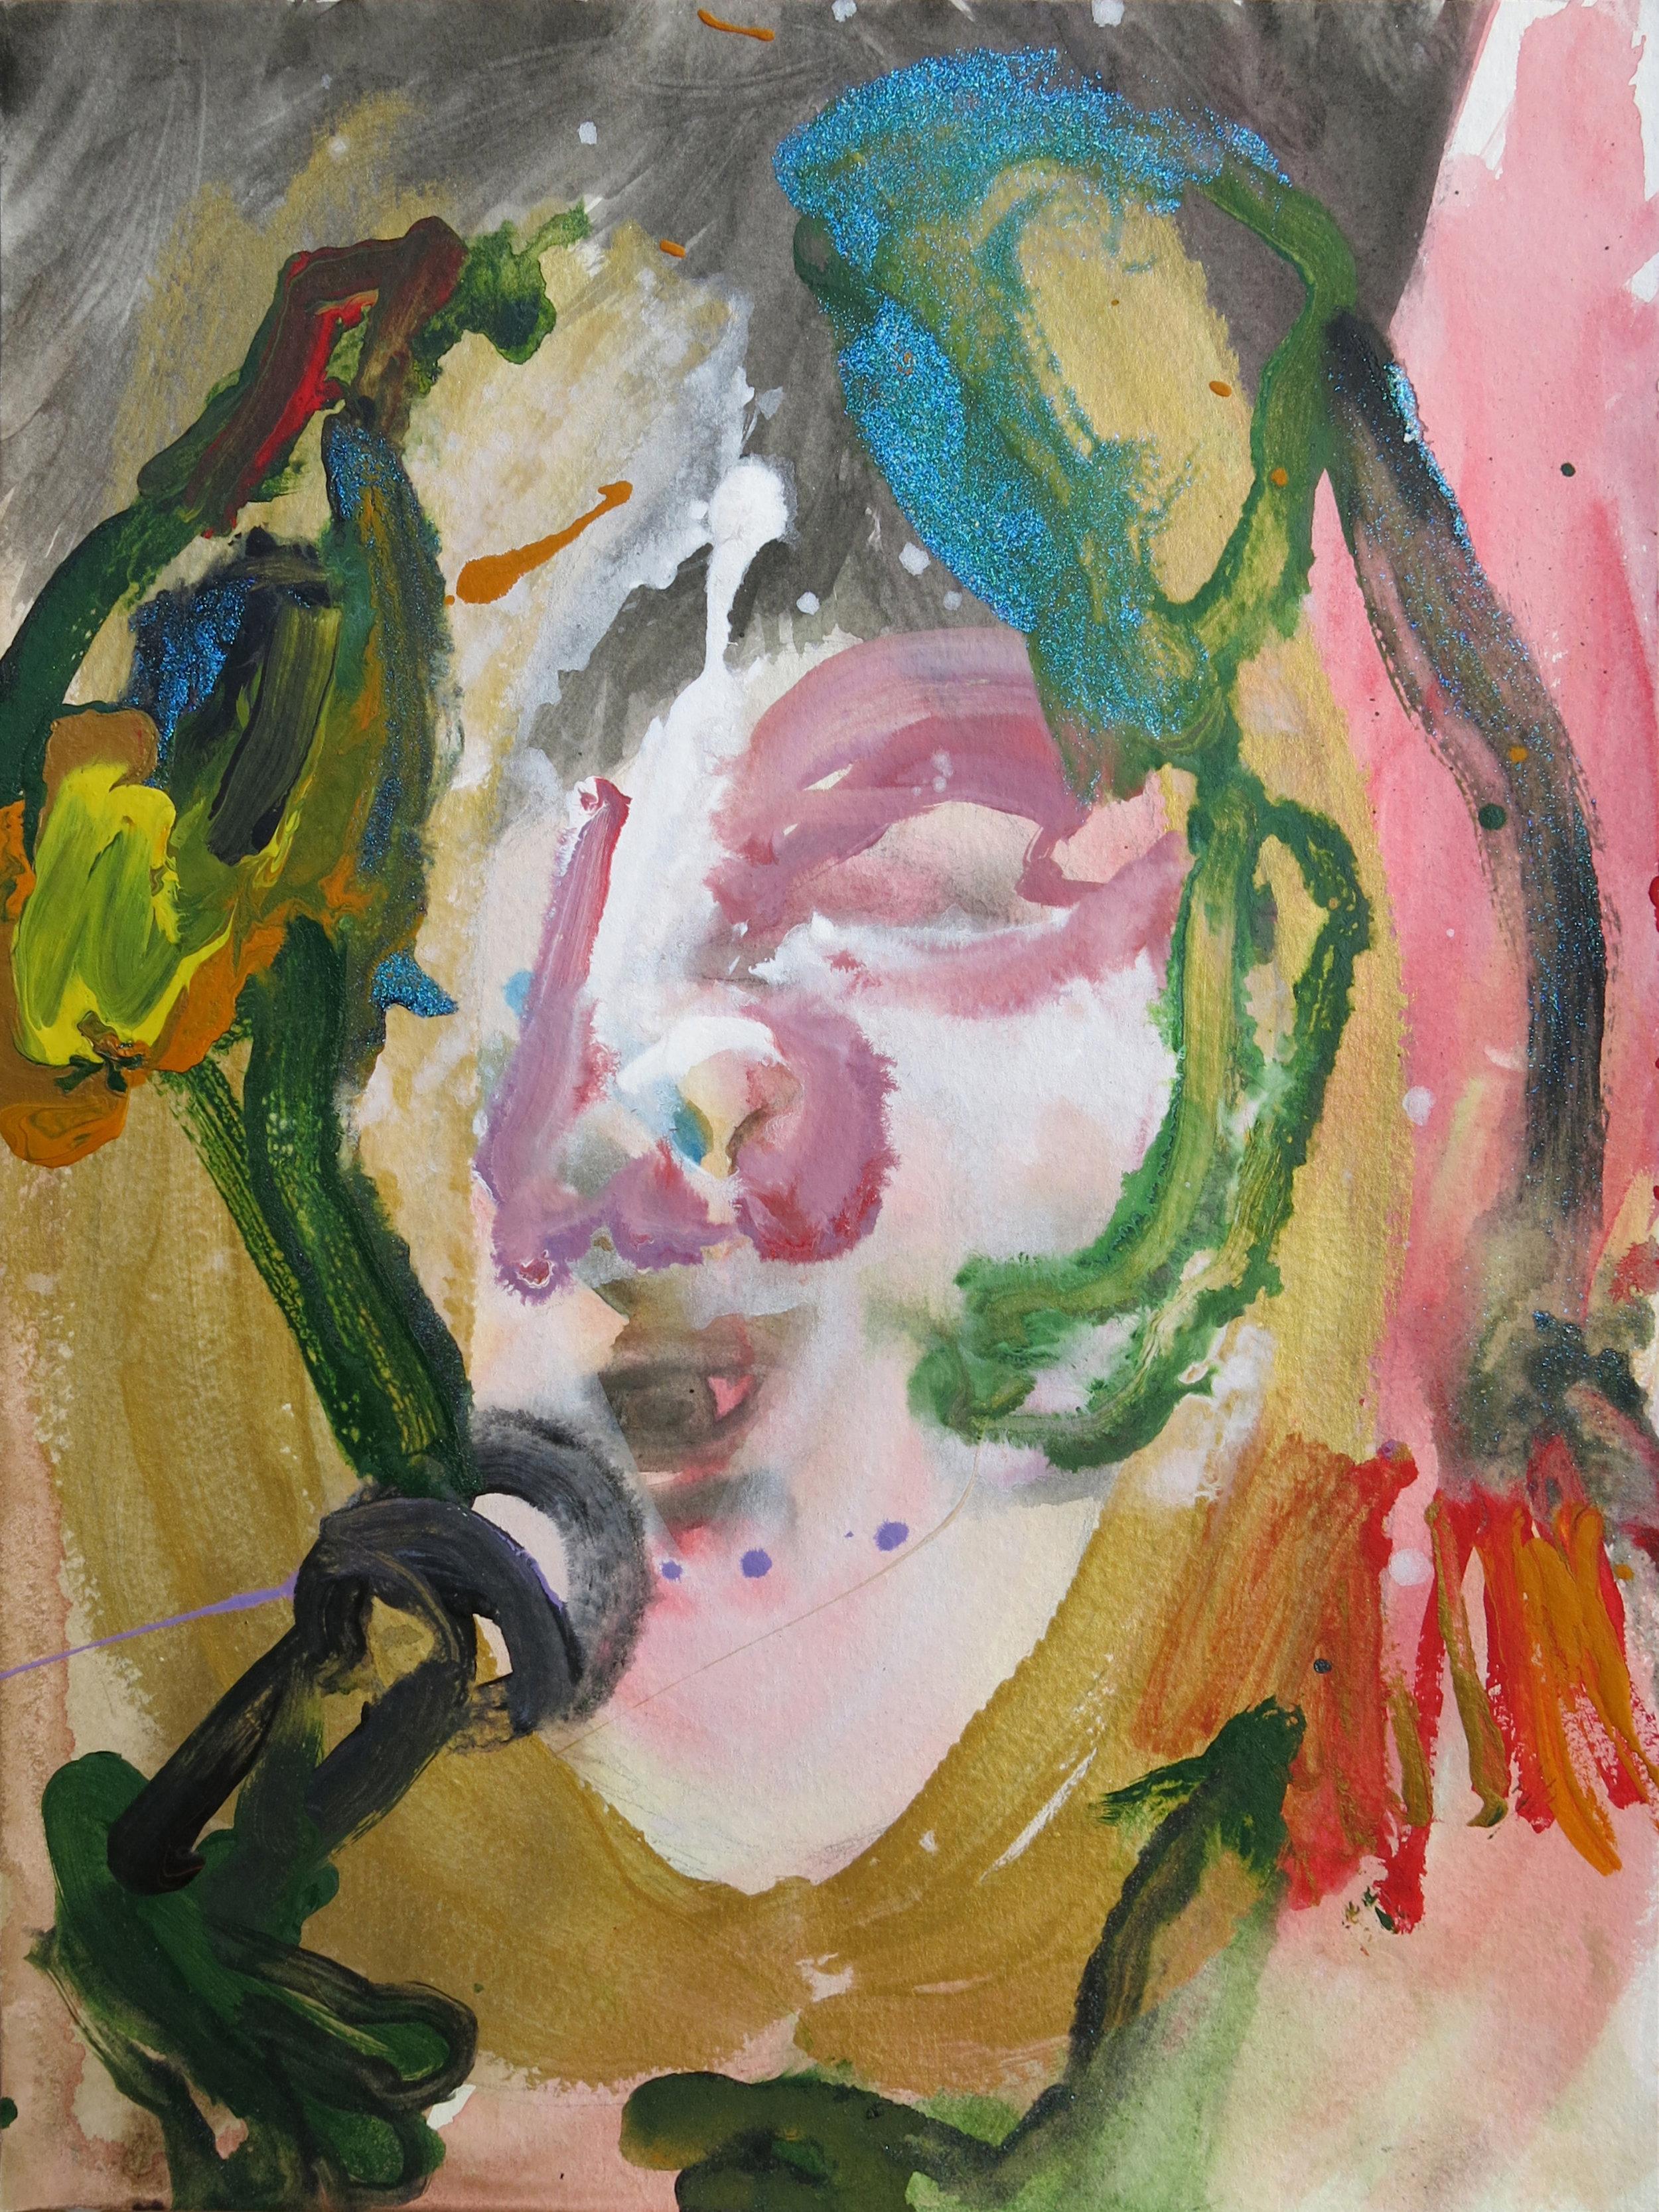 Barbra Streisand Portrait #84